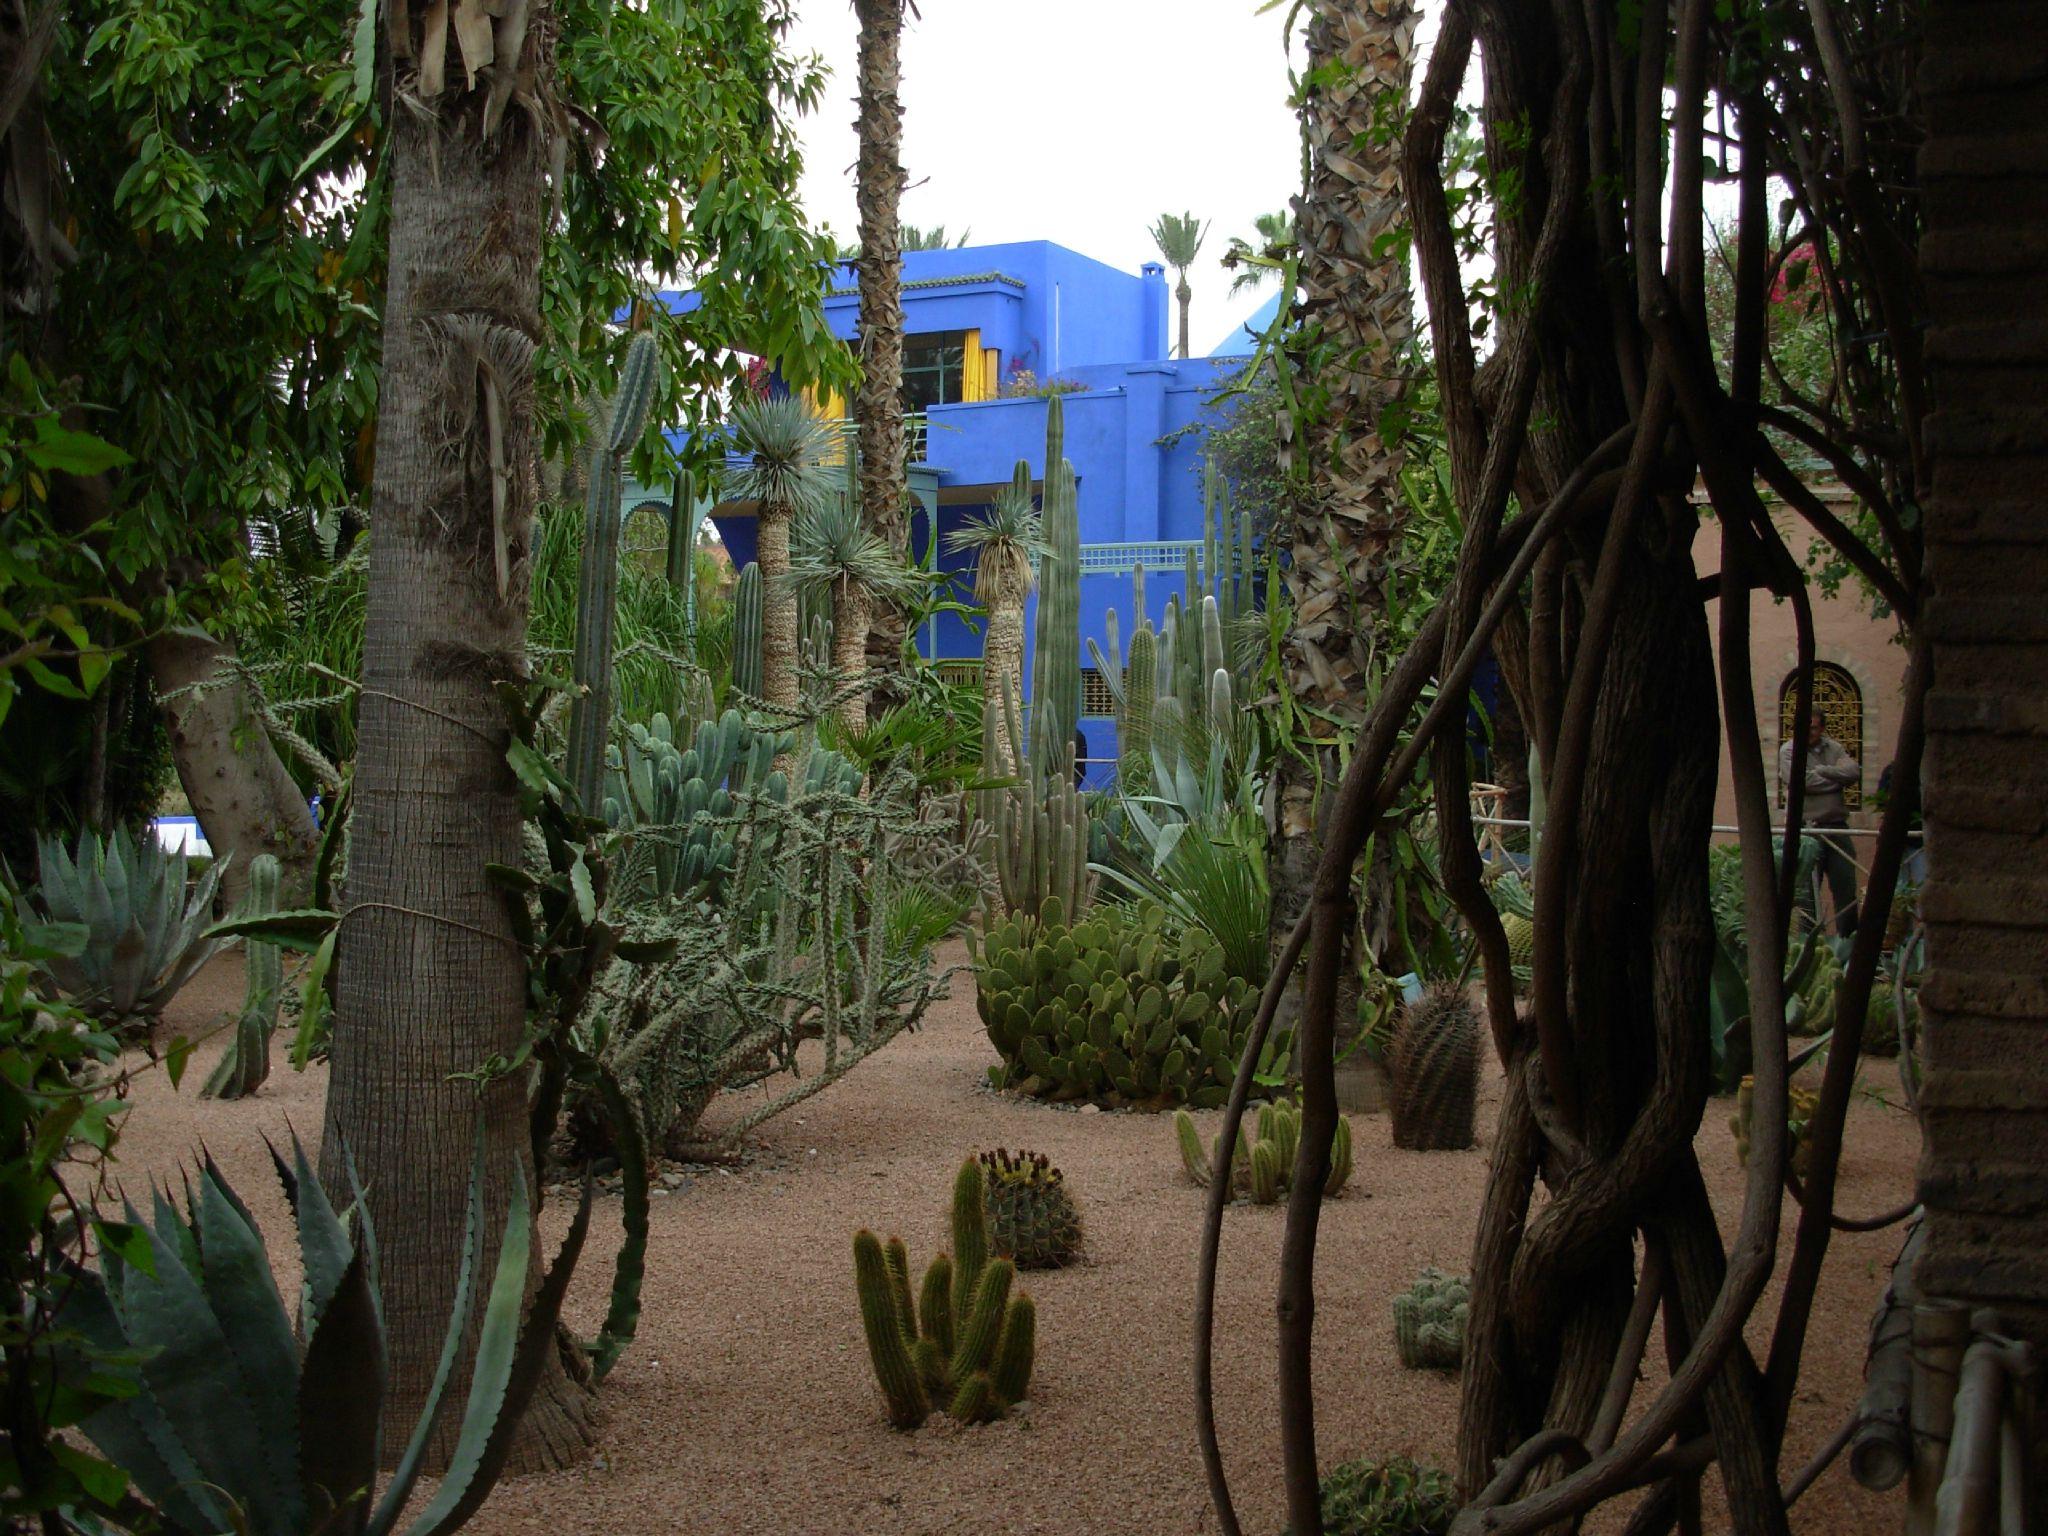 Maroc ... Le jardin 'Majorelle'